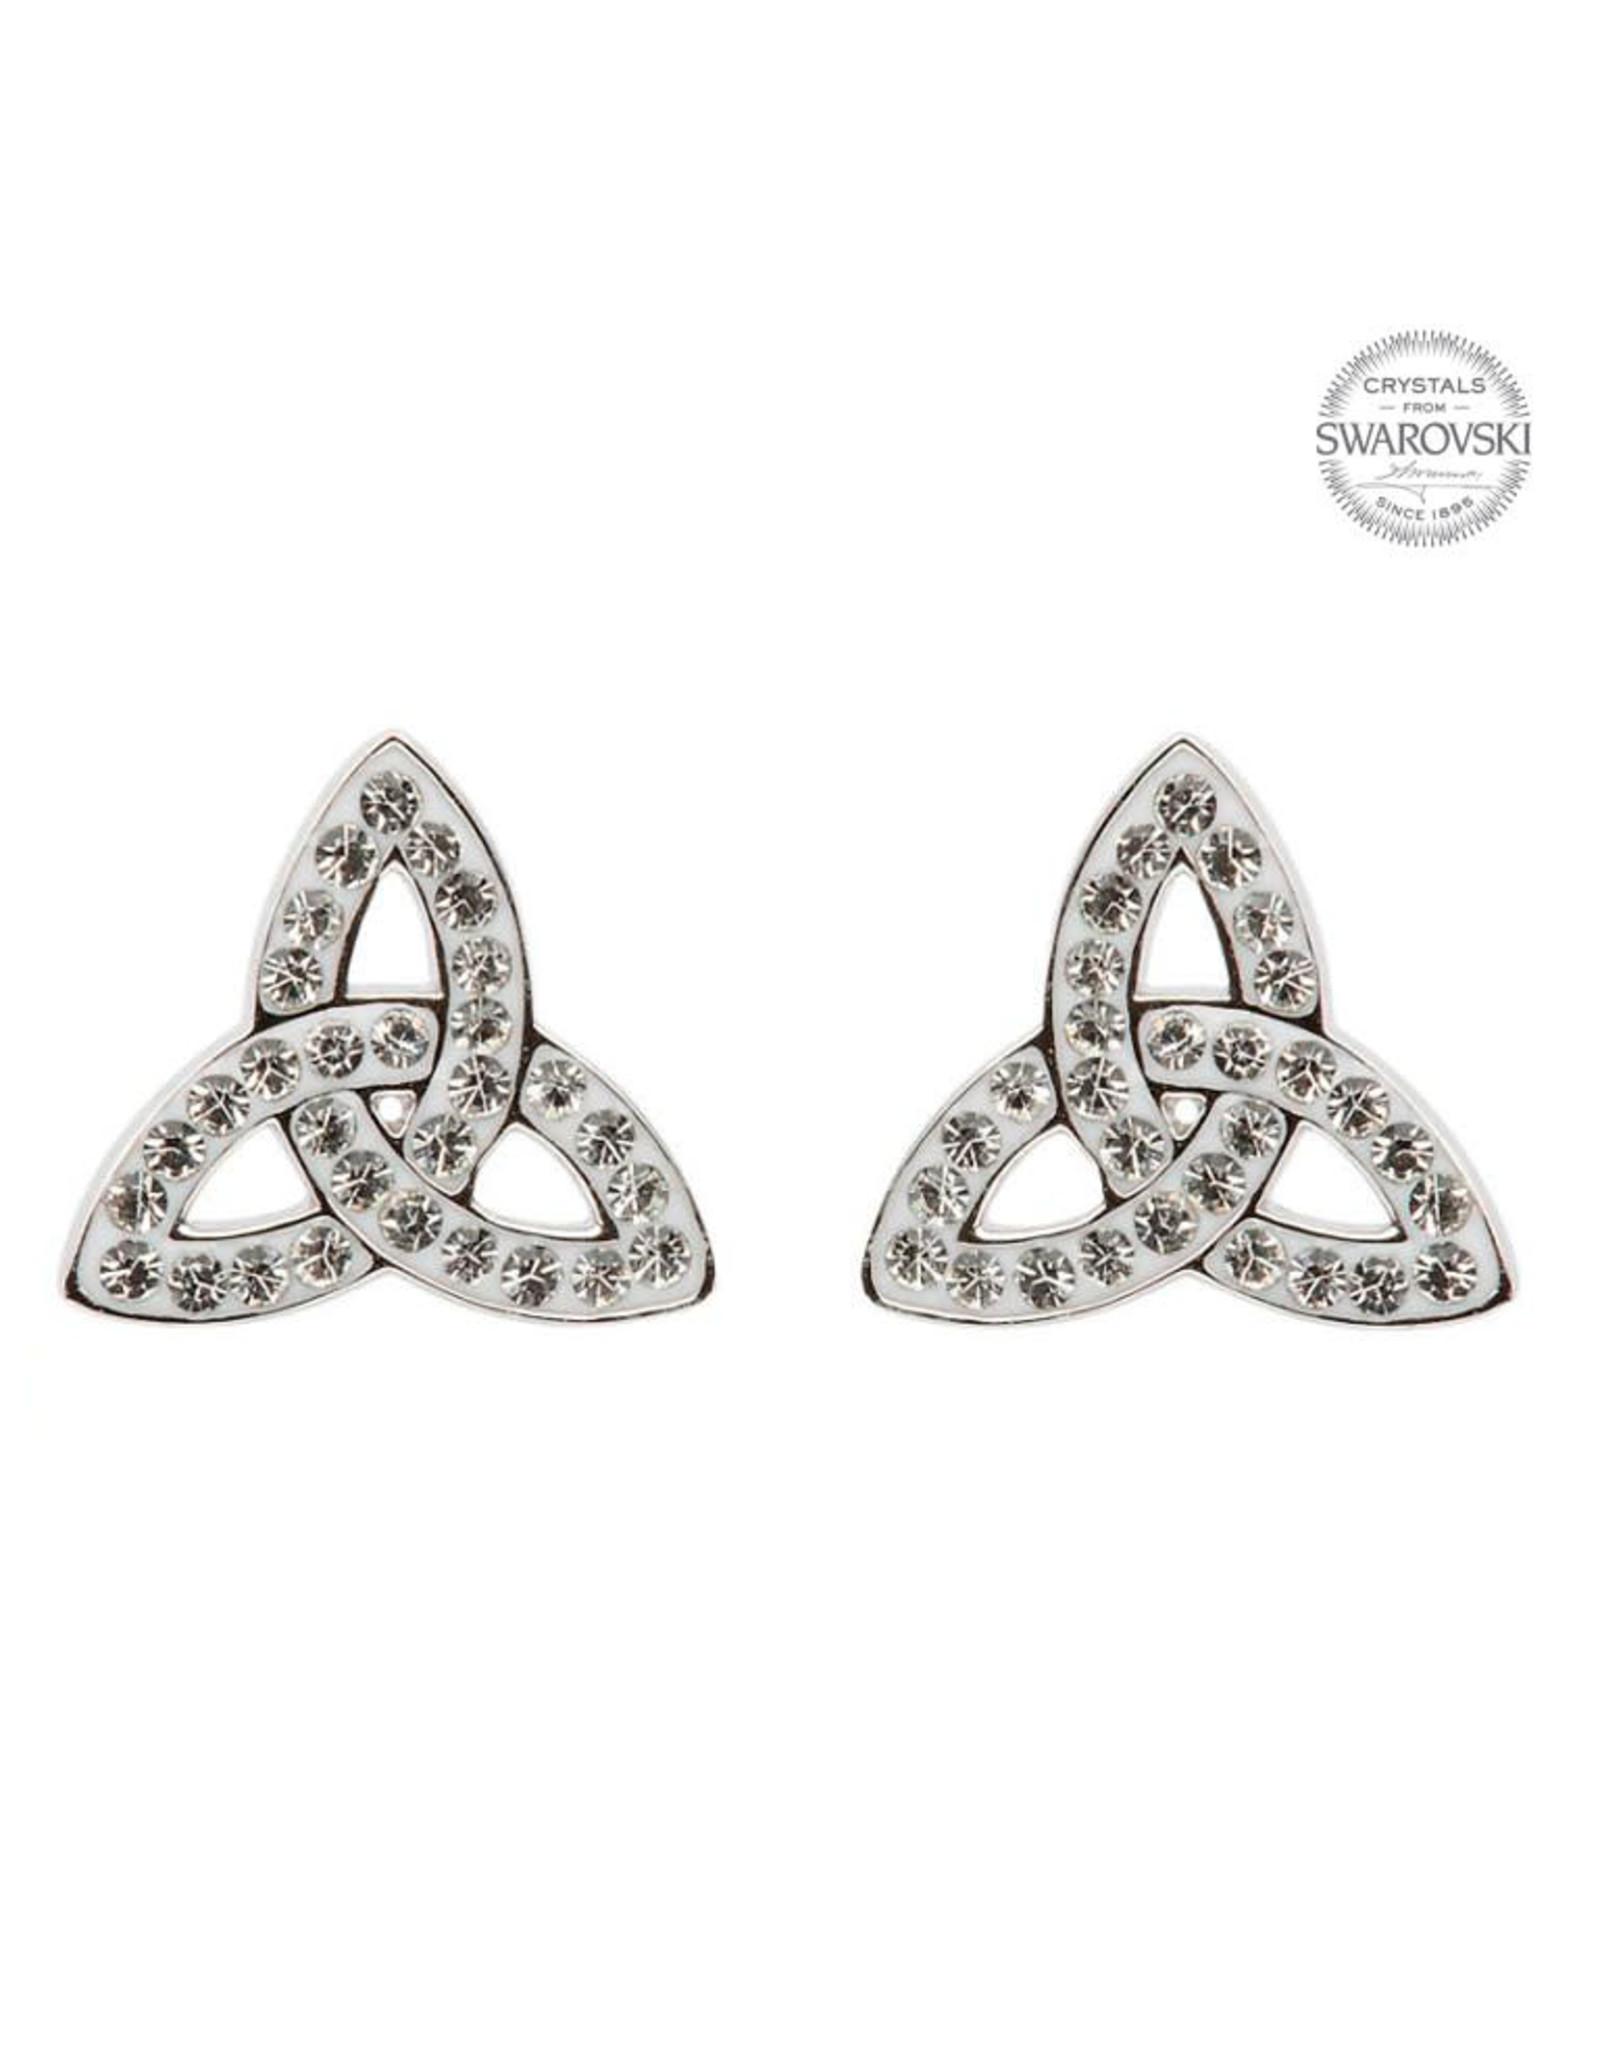 Shanore Silver Trinity Knot Stud Swarovski Earrings